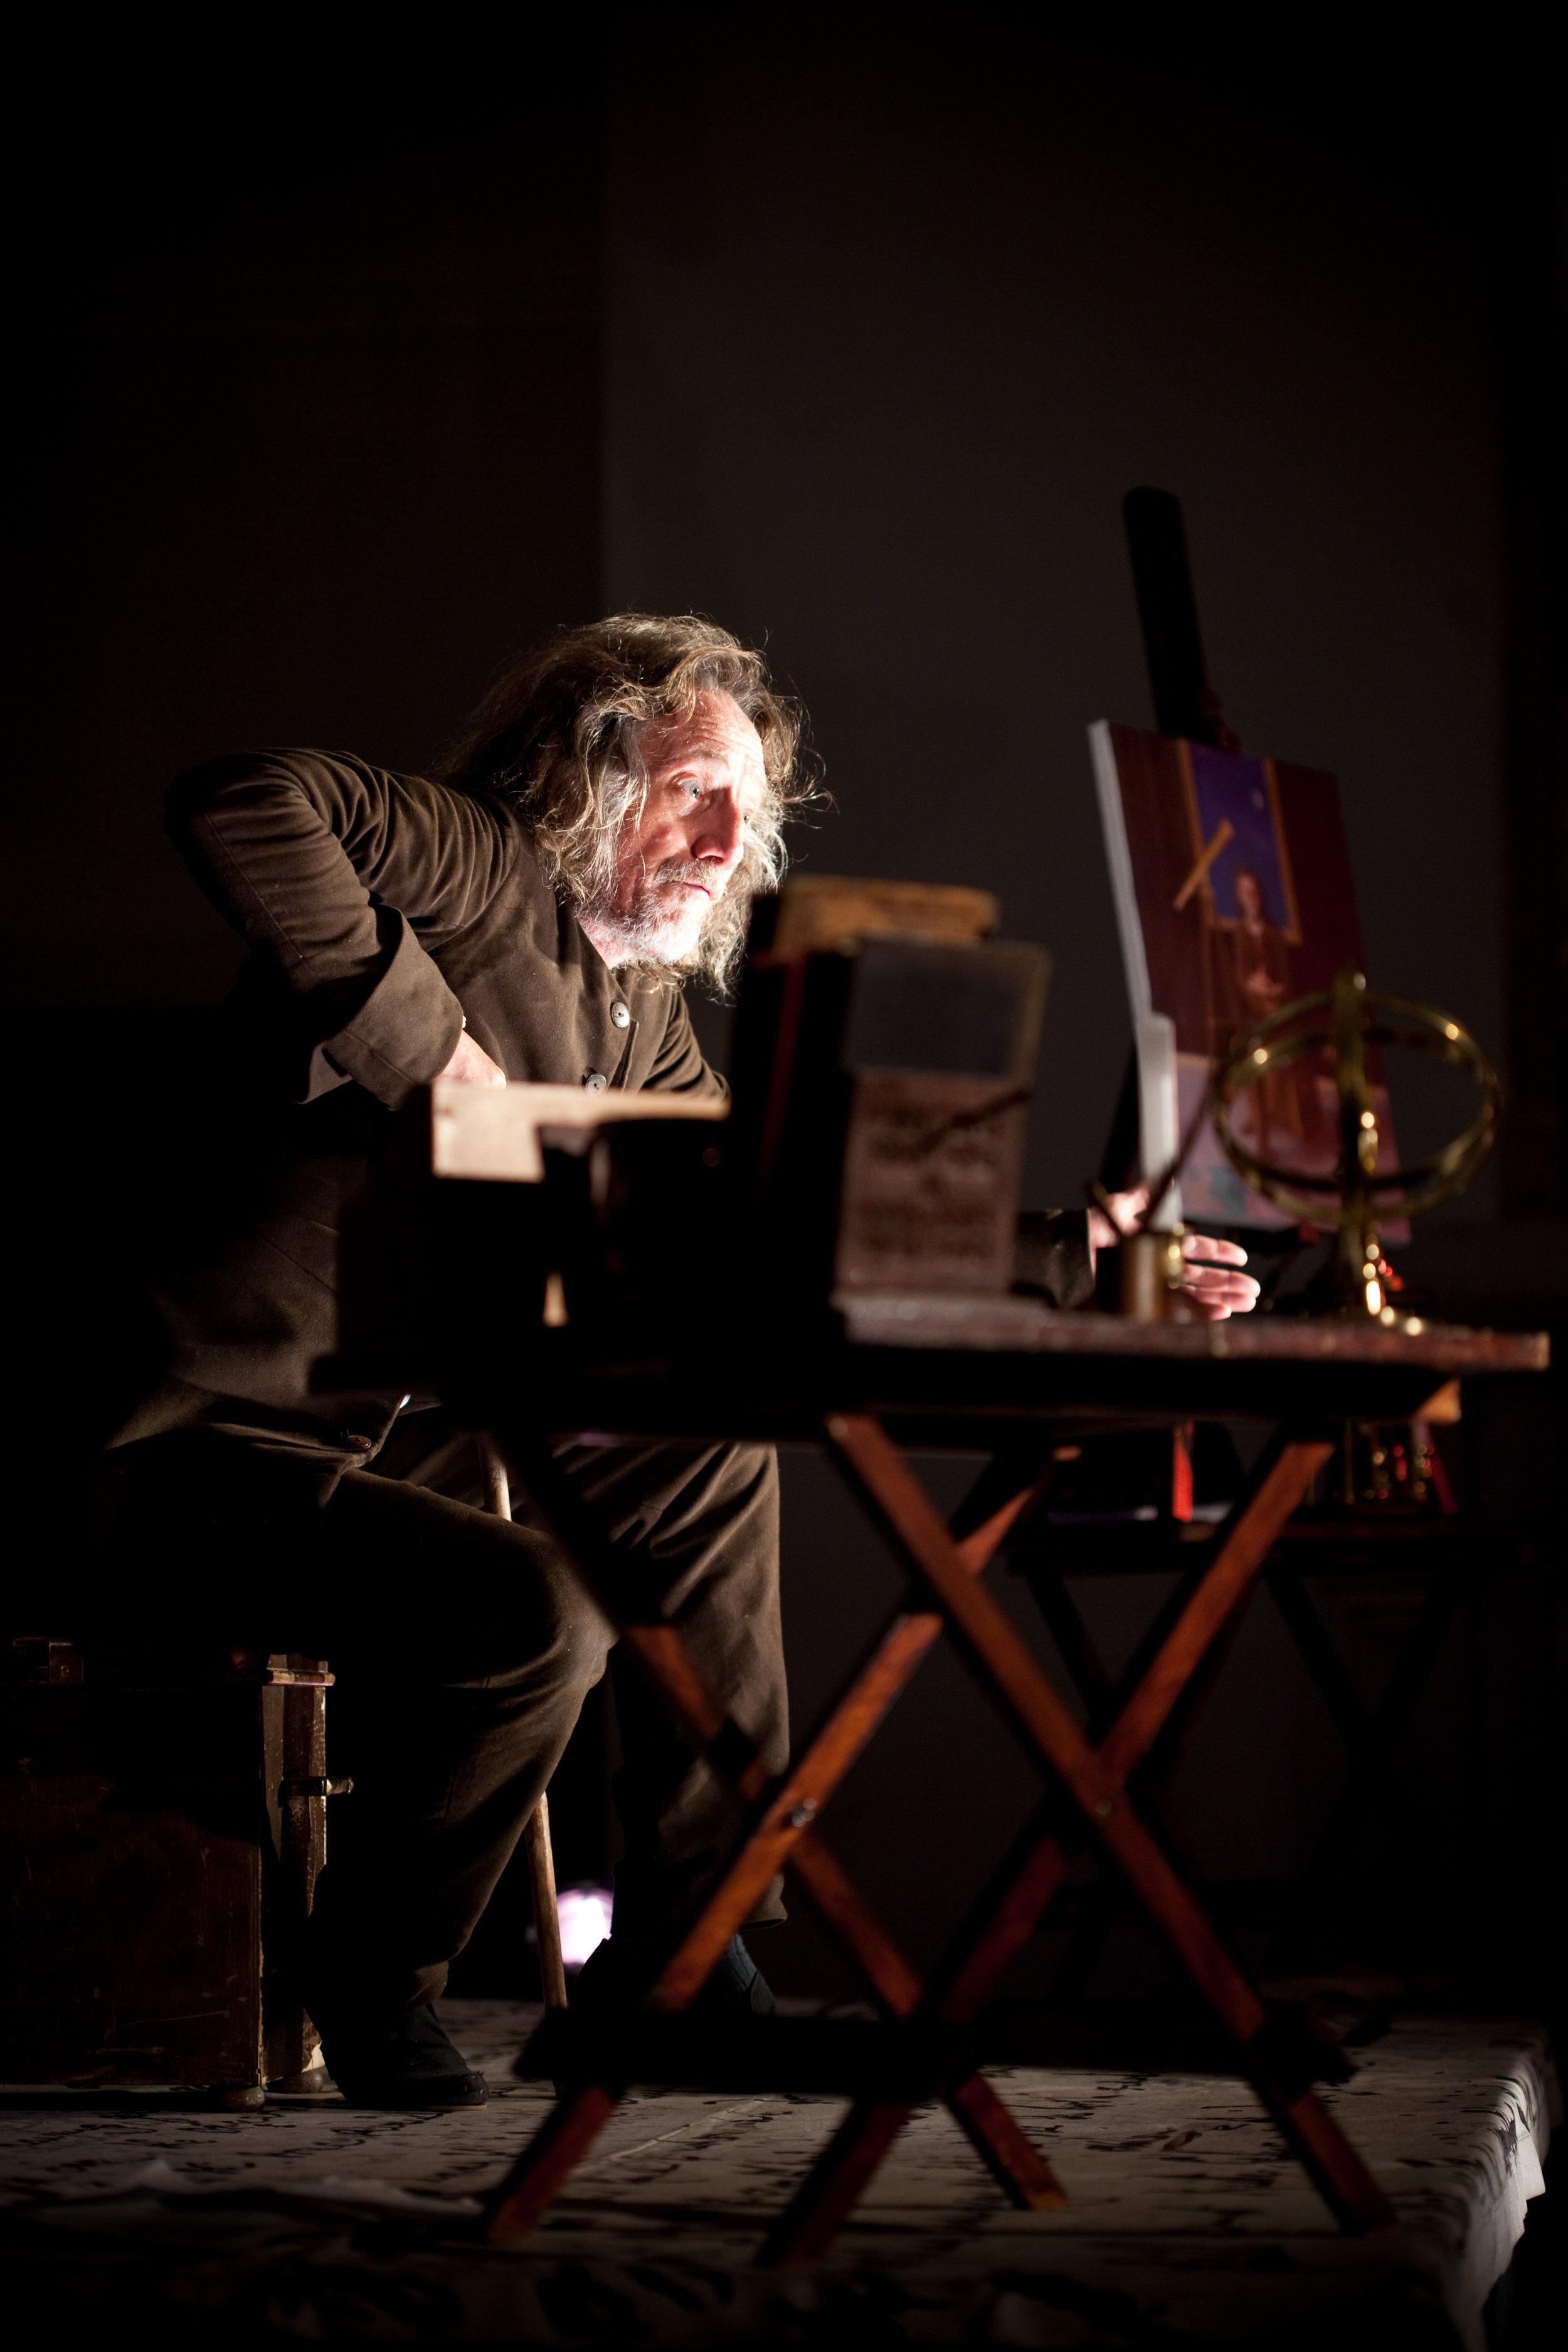 Chris Barnes as Robert Hooke